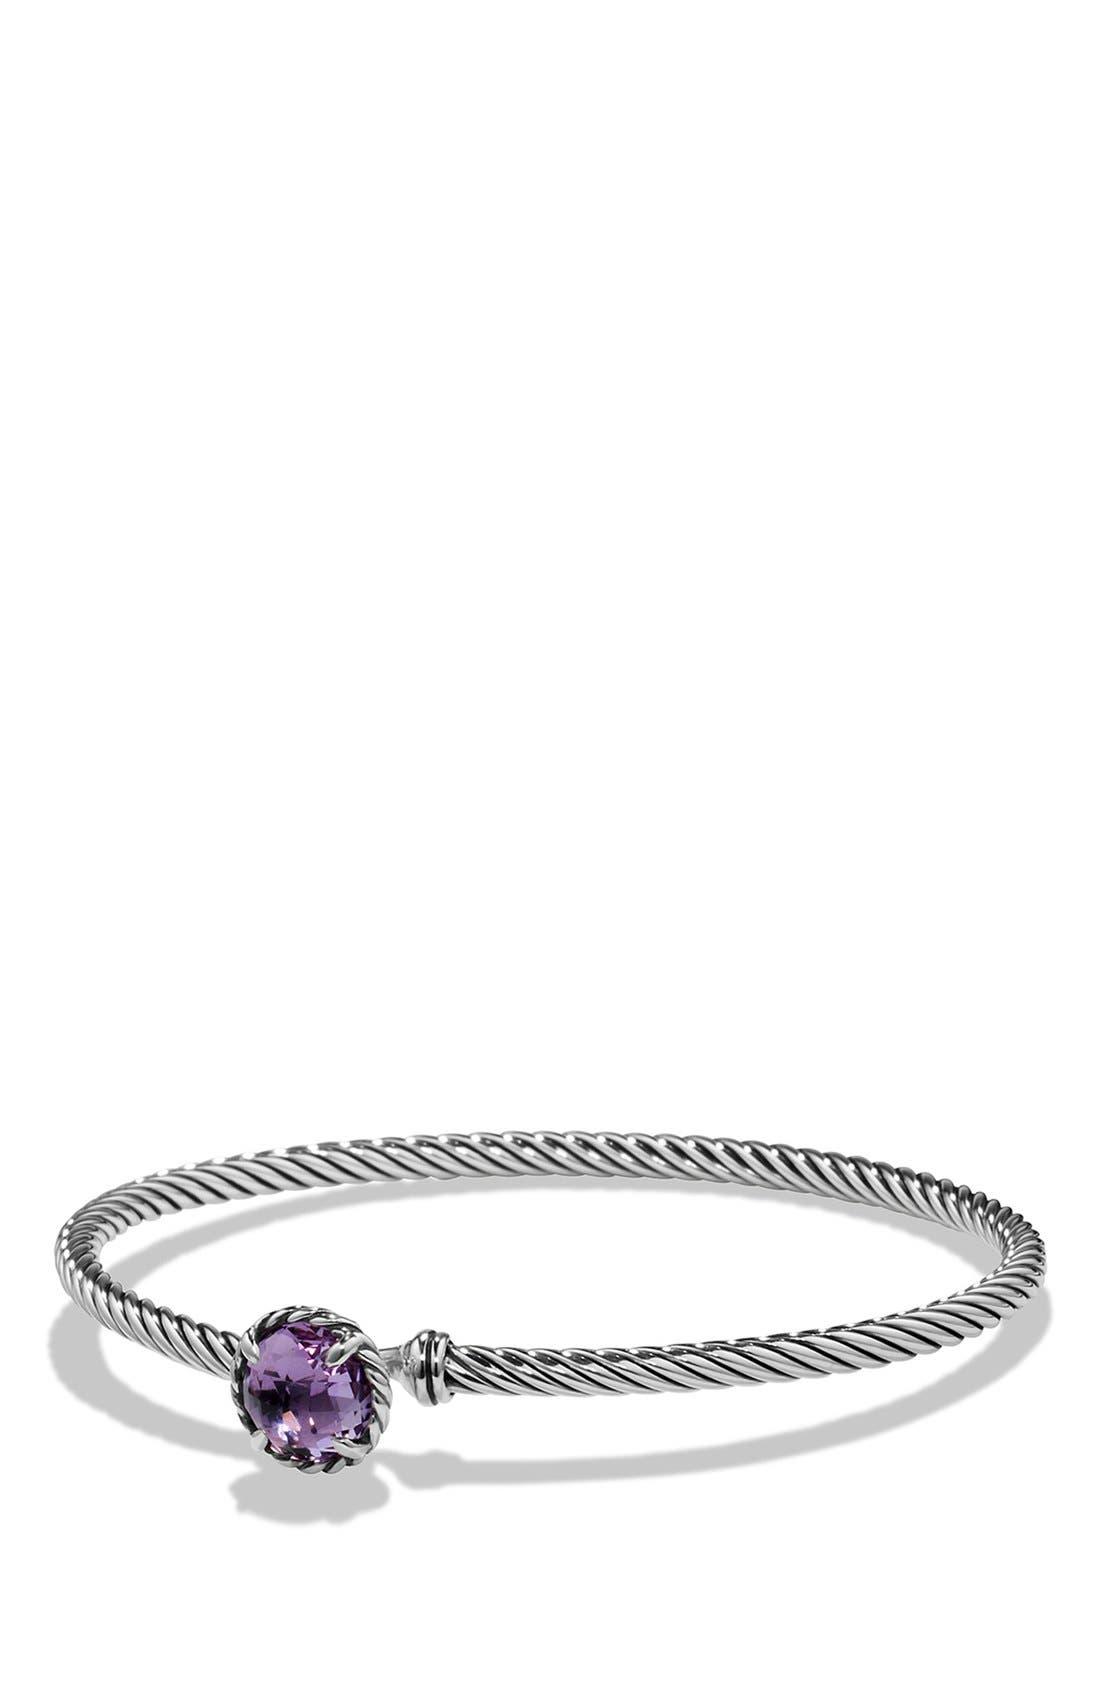 DAVID YURMAN 'Color Classics' Bangle Bracelet, Main, color, AMETHYST